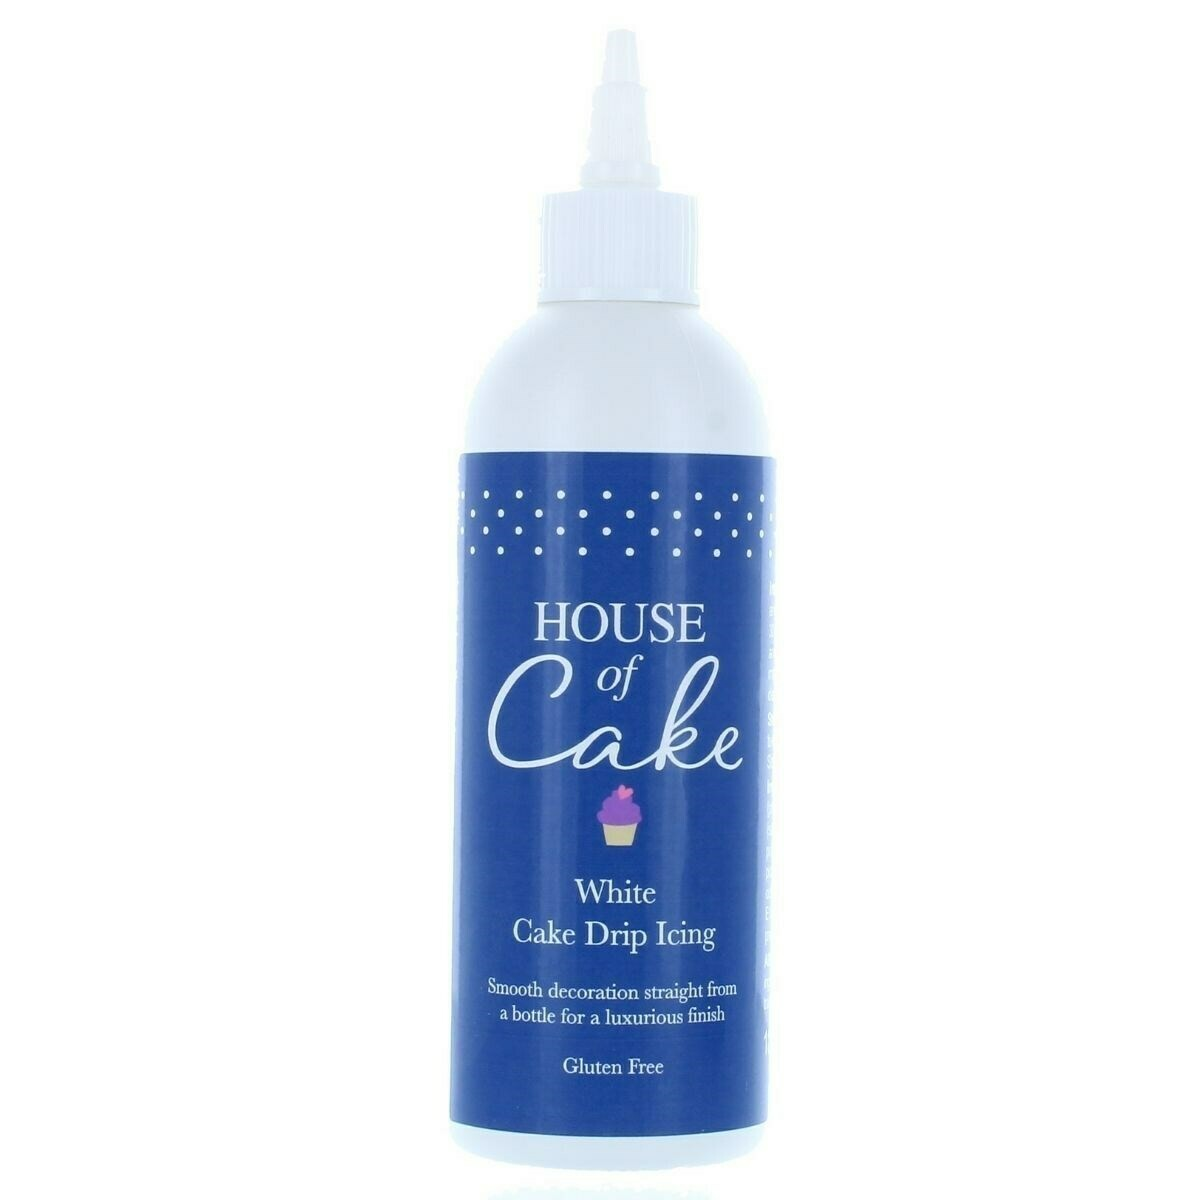 House of Cake Drip Icing -WHITE 180g - Γλάσο για Dripping Άσπρο